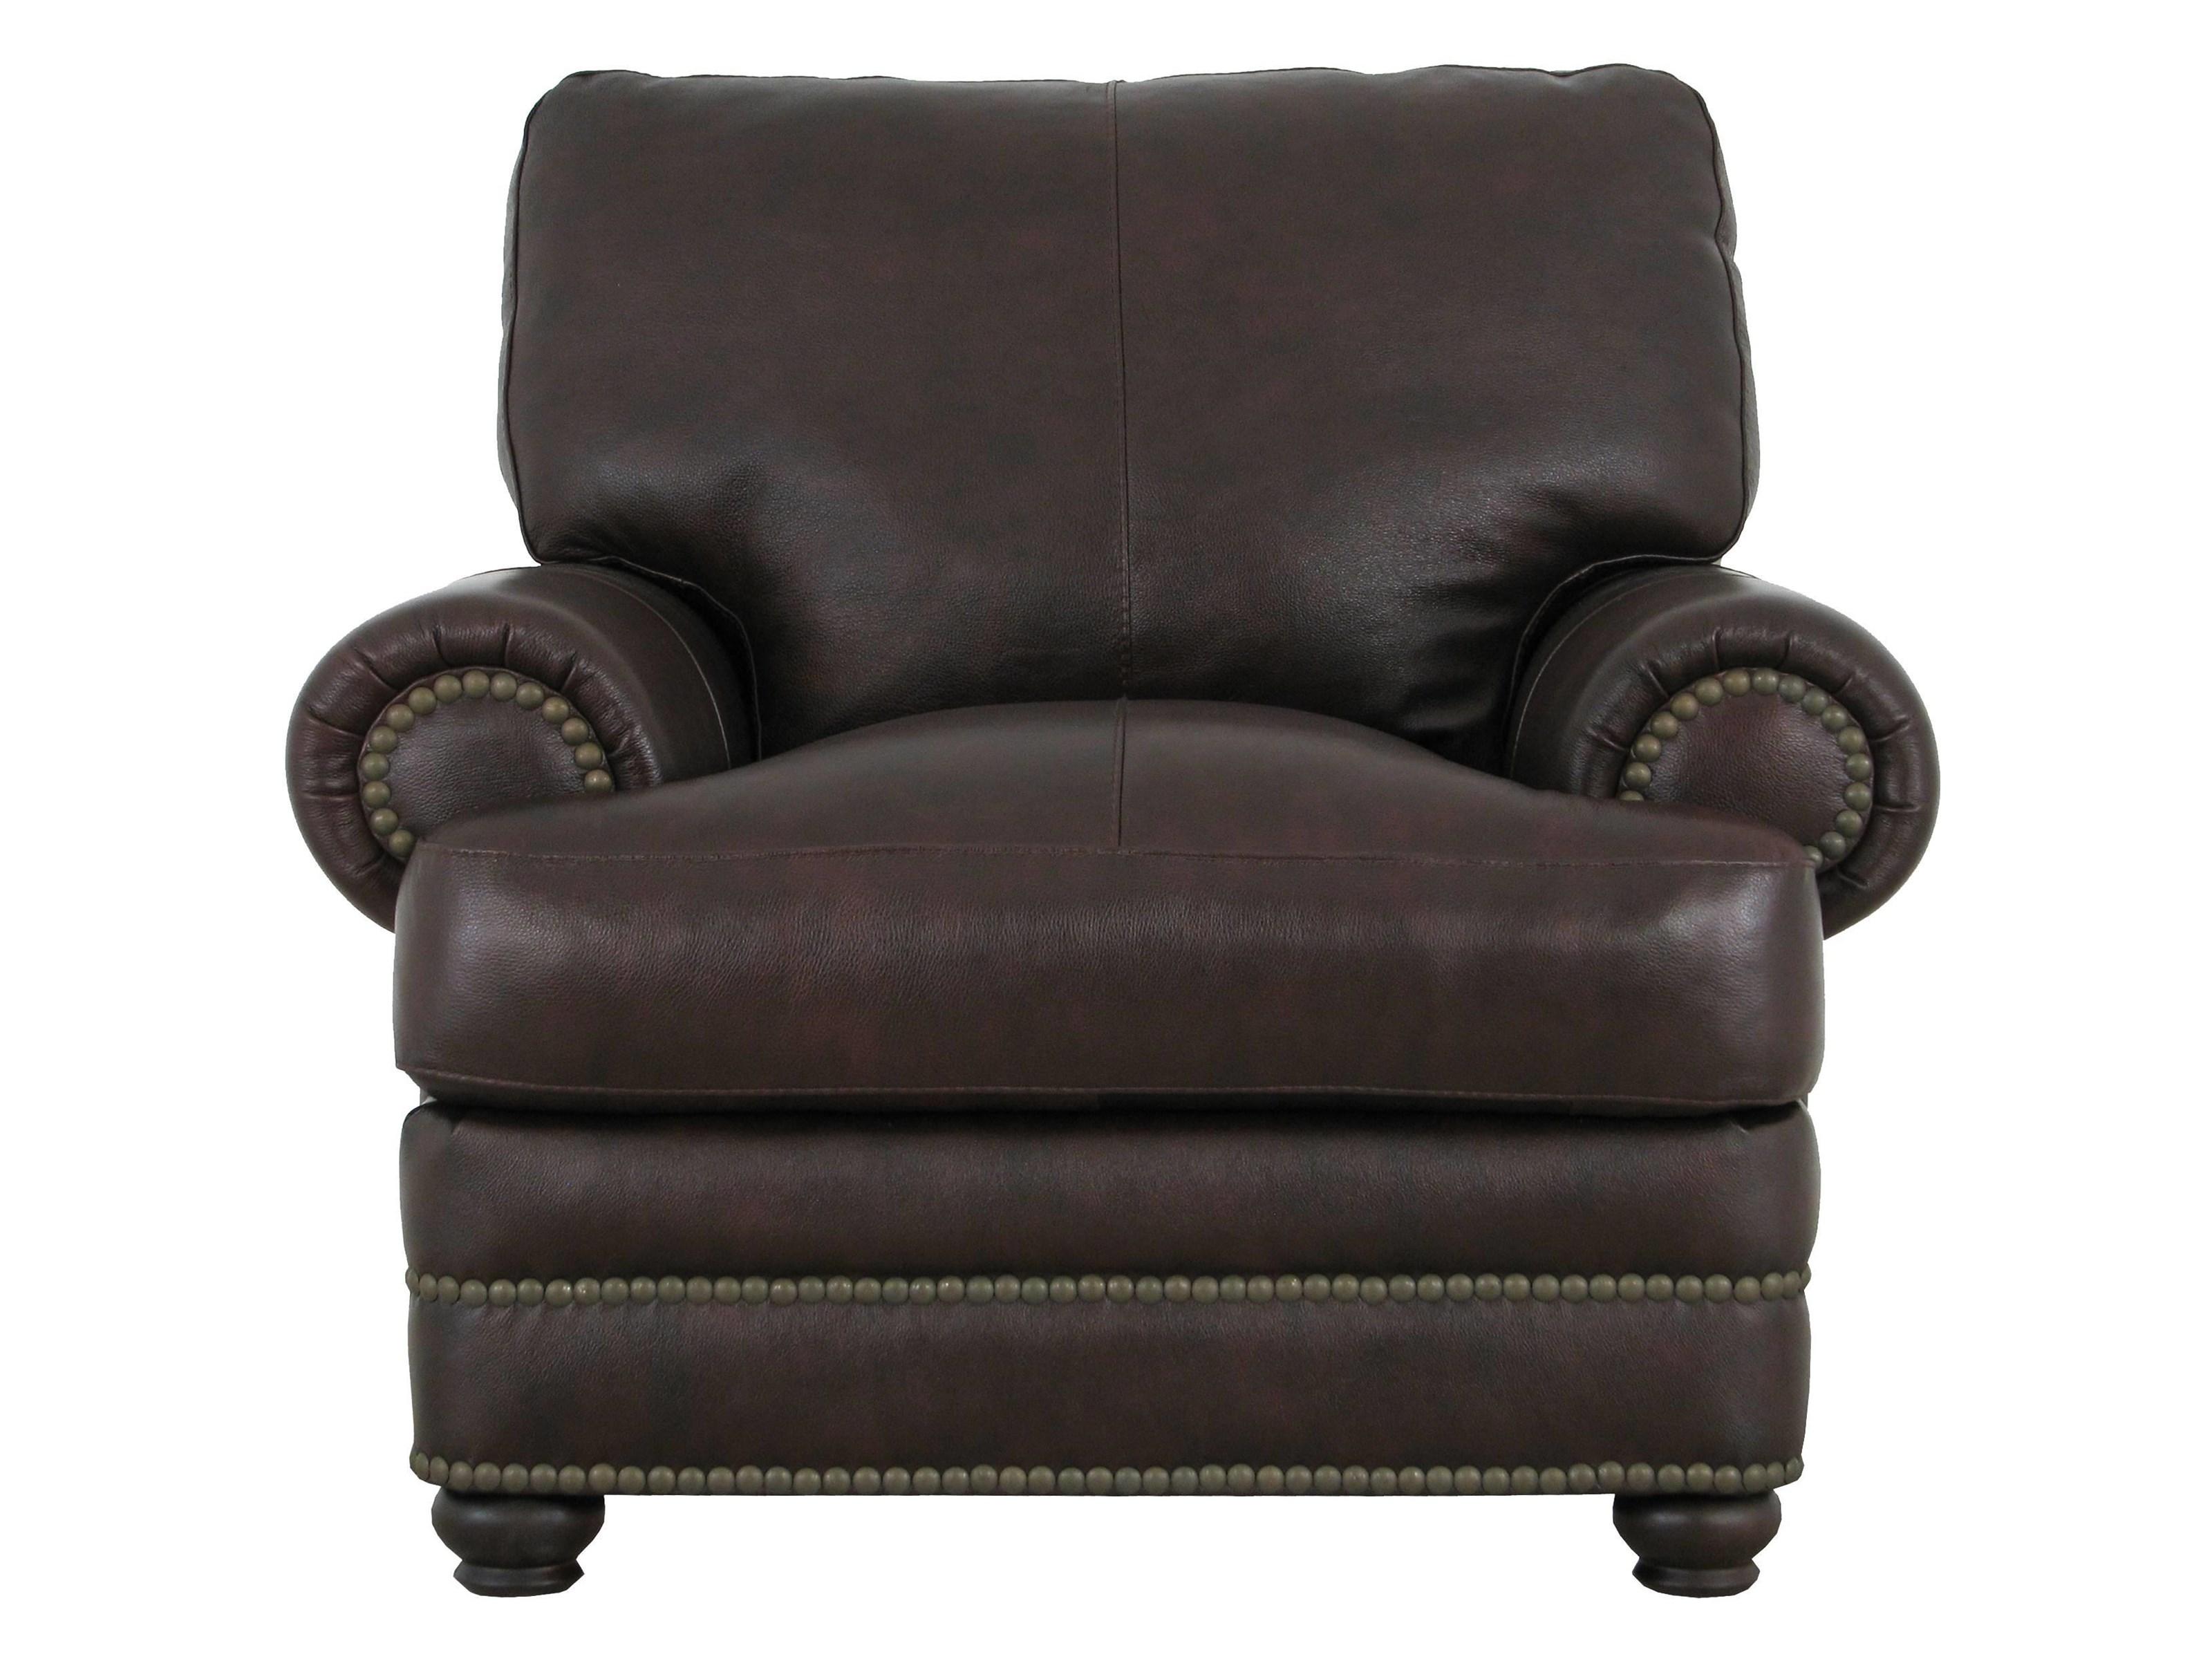 Soft Line 7103 Chair